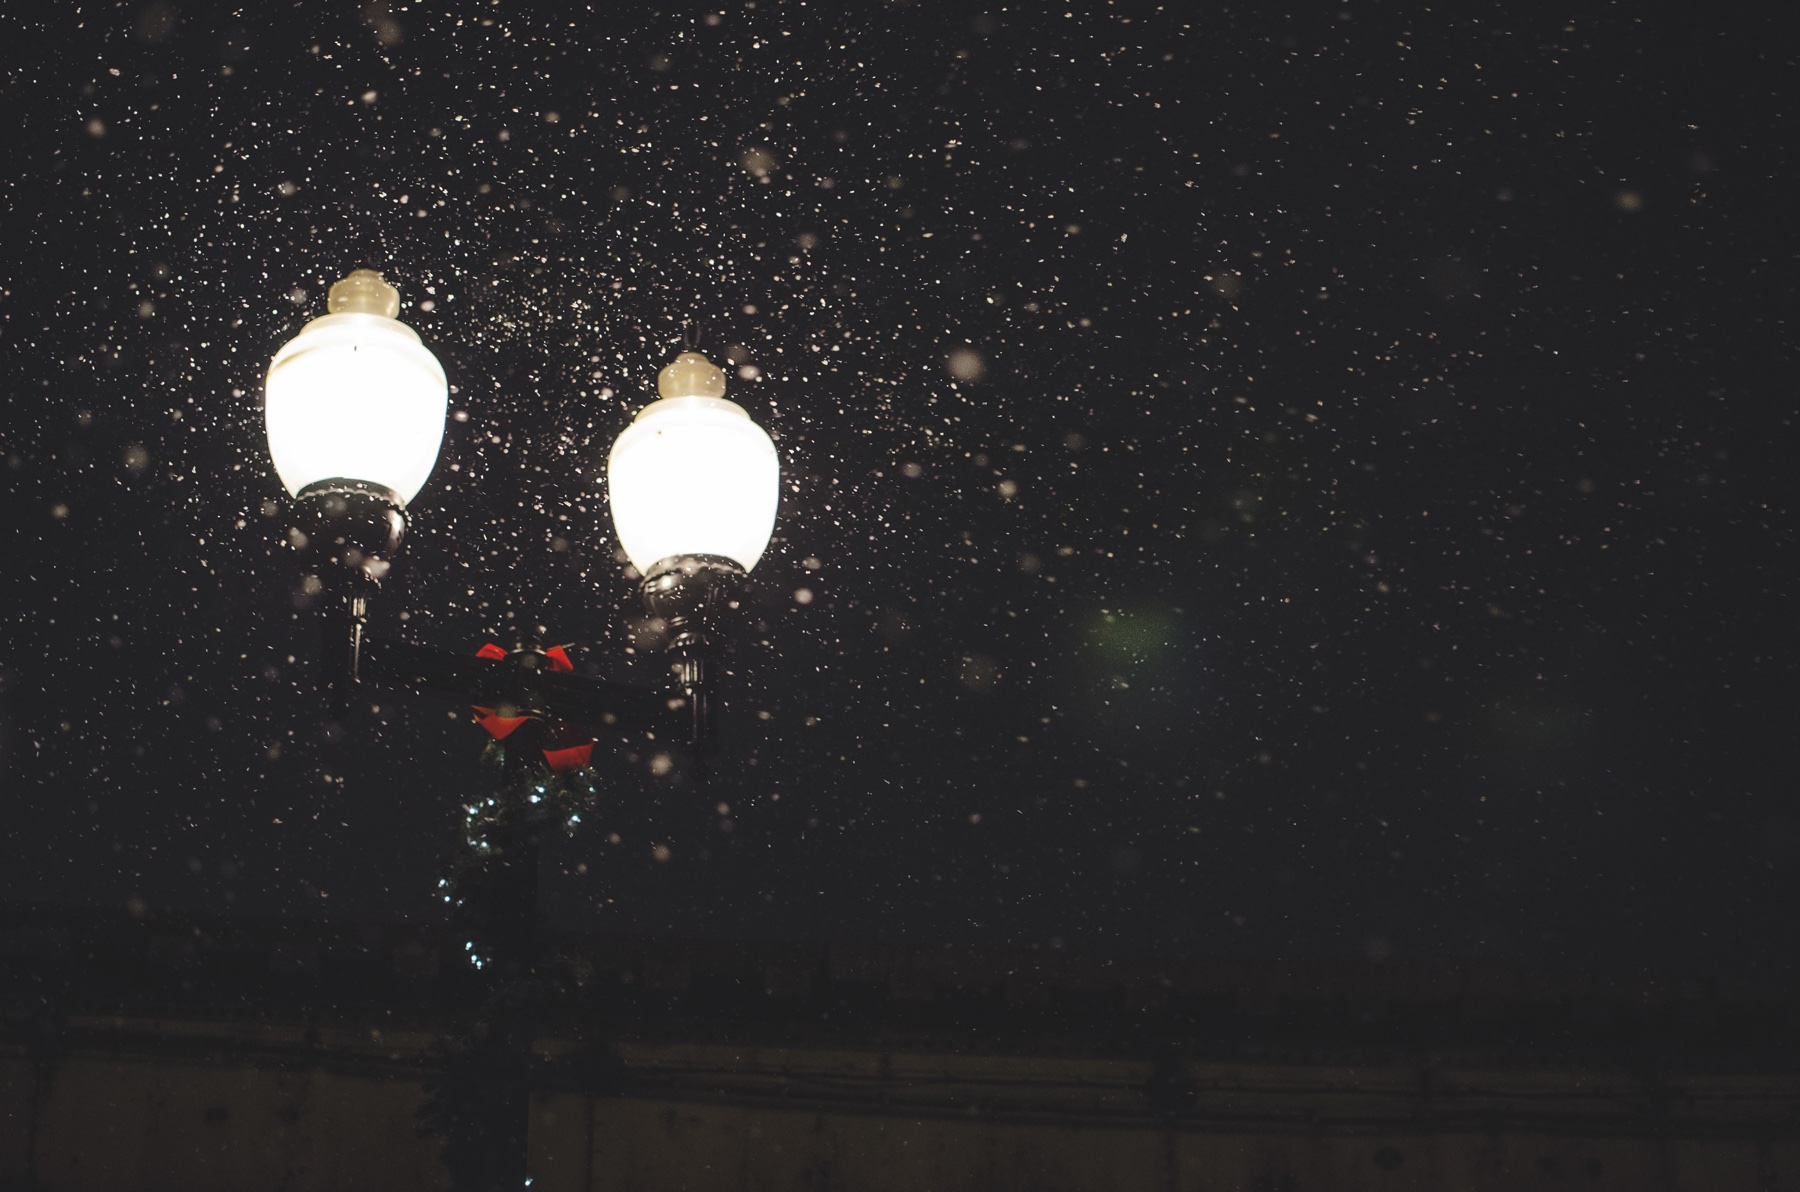 FF201912-street-lamp-336556